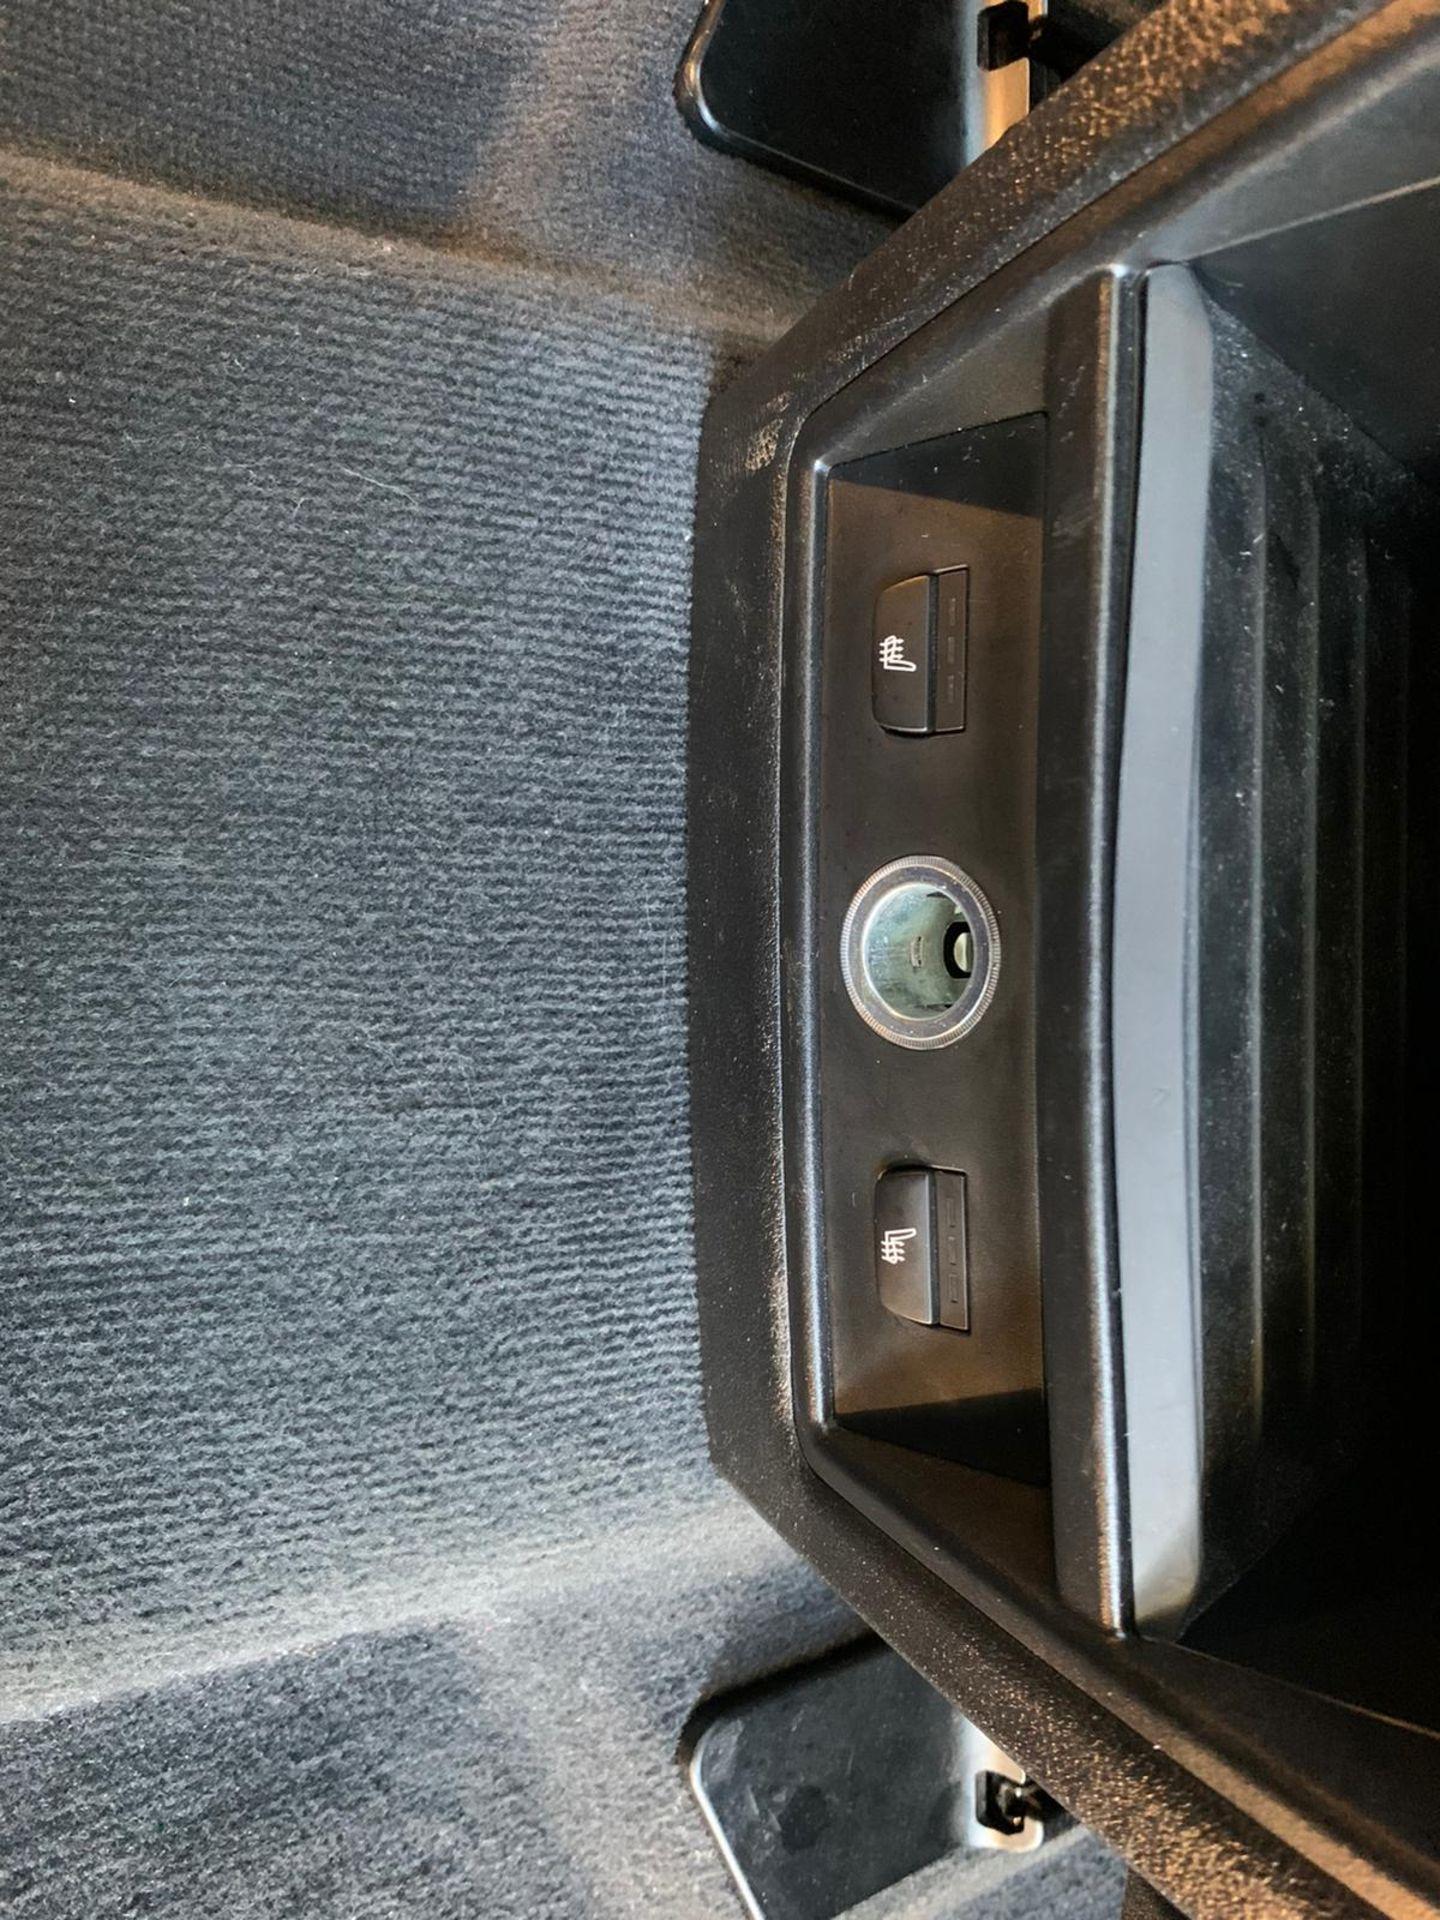 "(Reserve Met) BMW X5 2.0d S-DRIVE ""Special Equipment"" Auto- 7 Seater -16 Reg - Sat Nav- (New Shape) - Image 43 of 43"